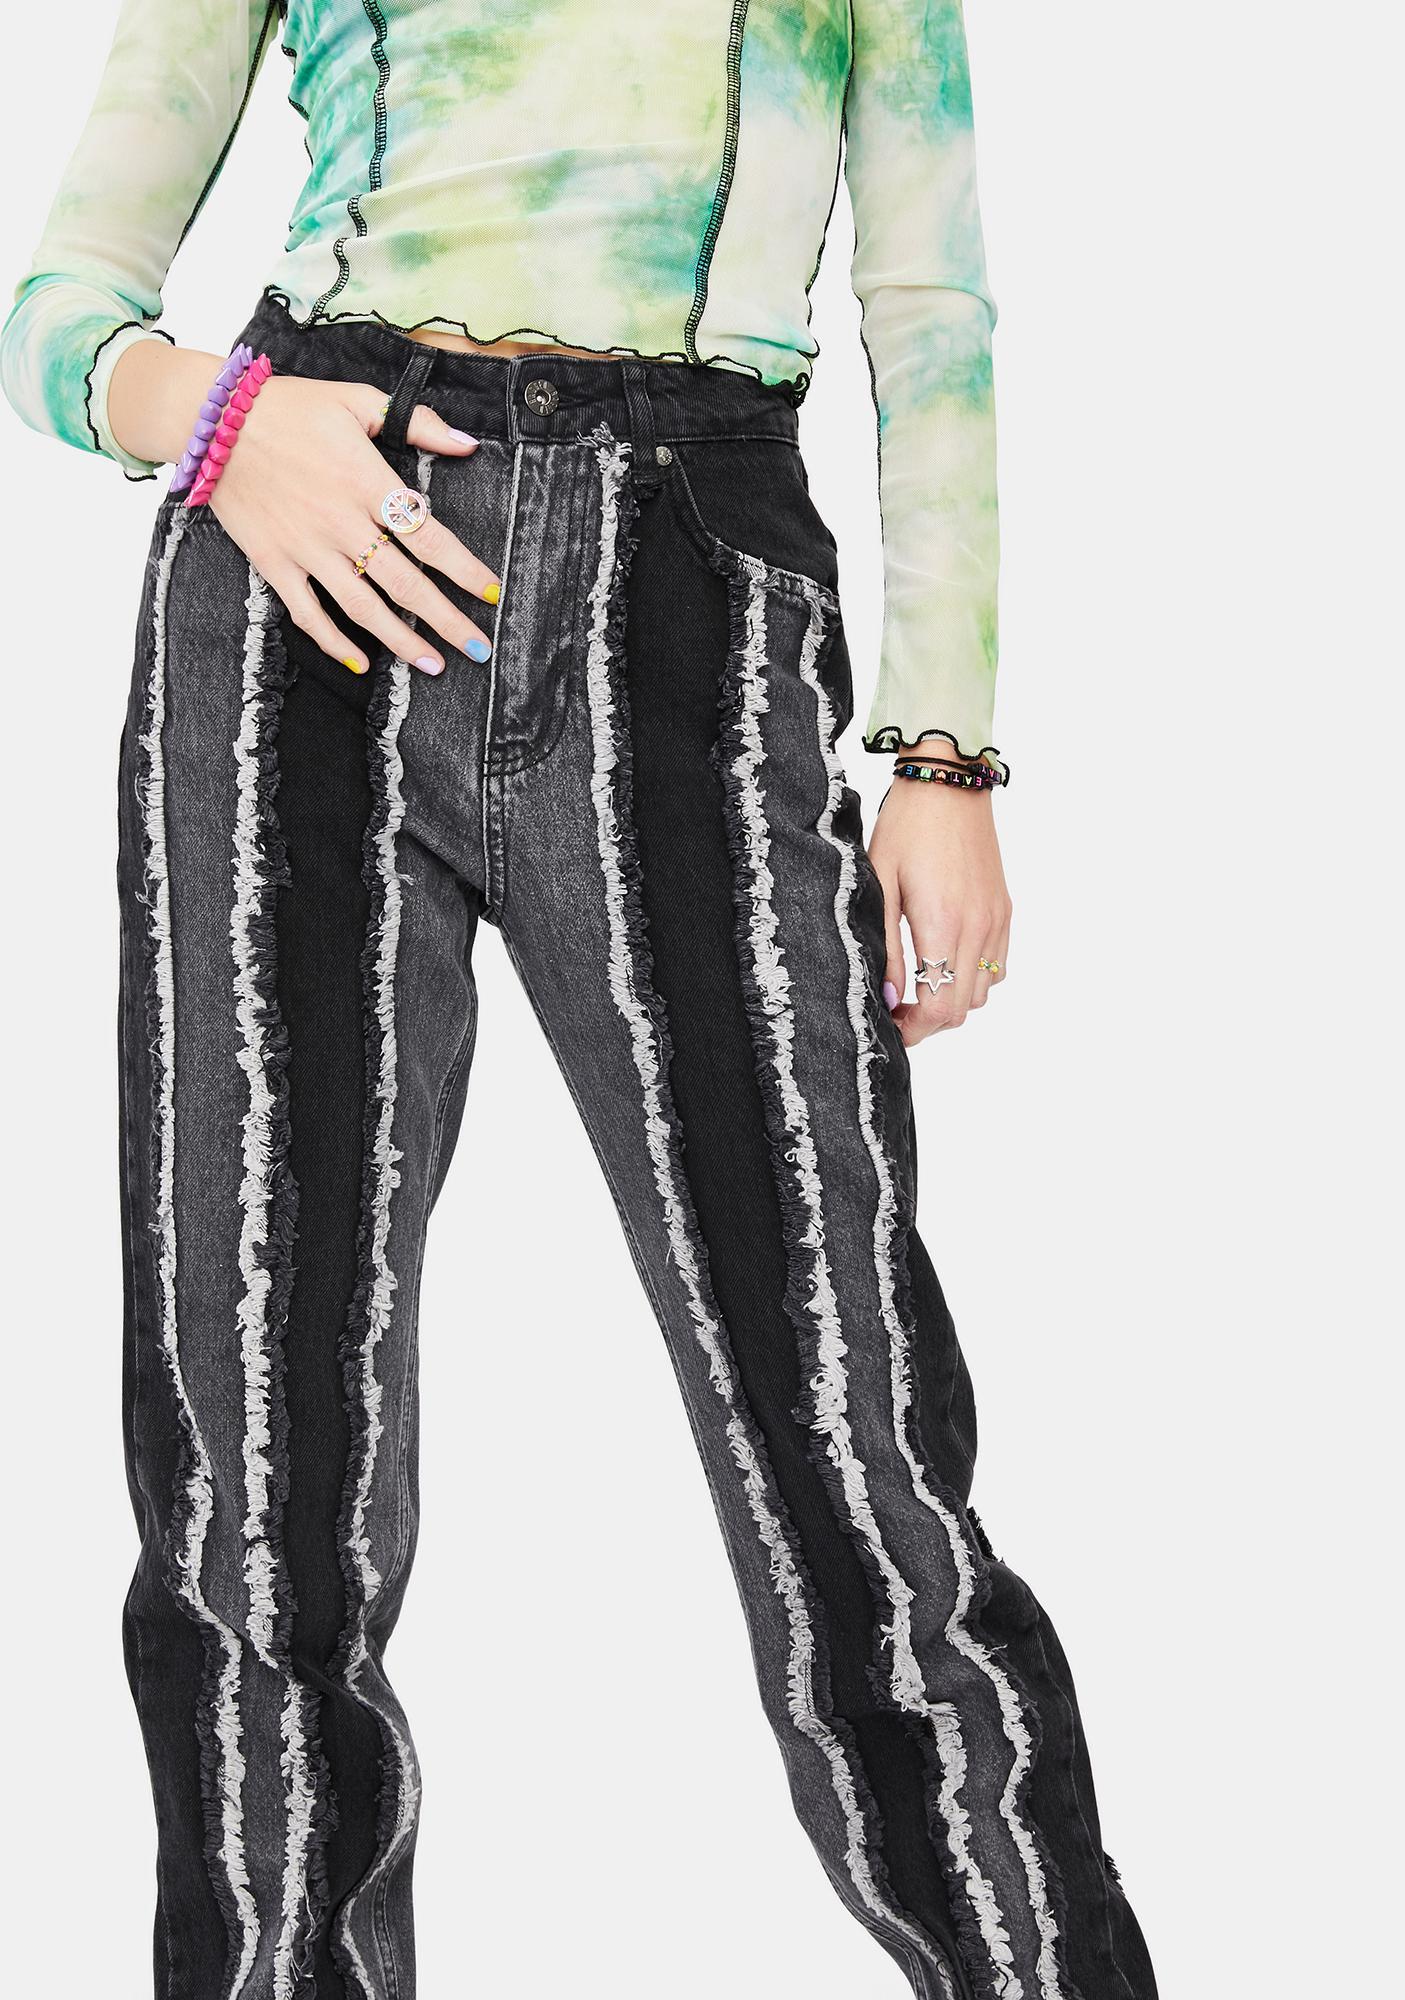 The Ragged Priest Charcoal Breacher Distressed Denim Jeans